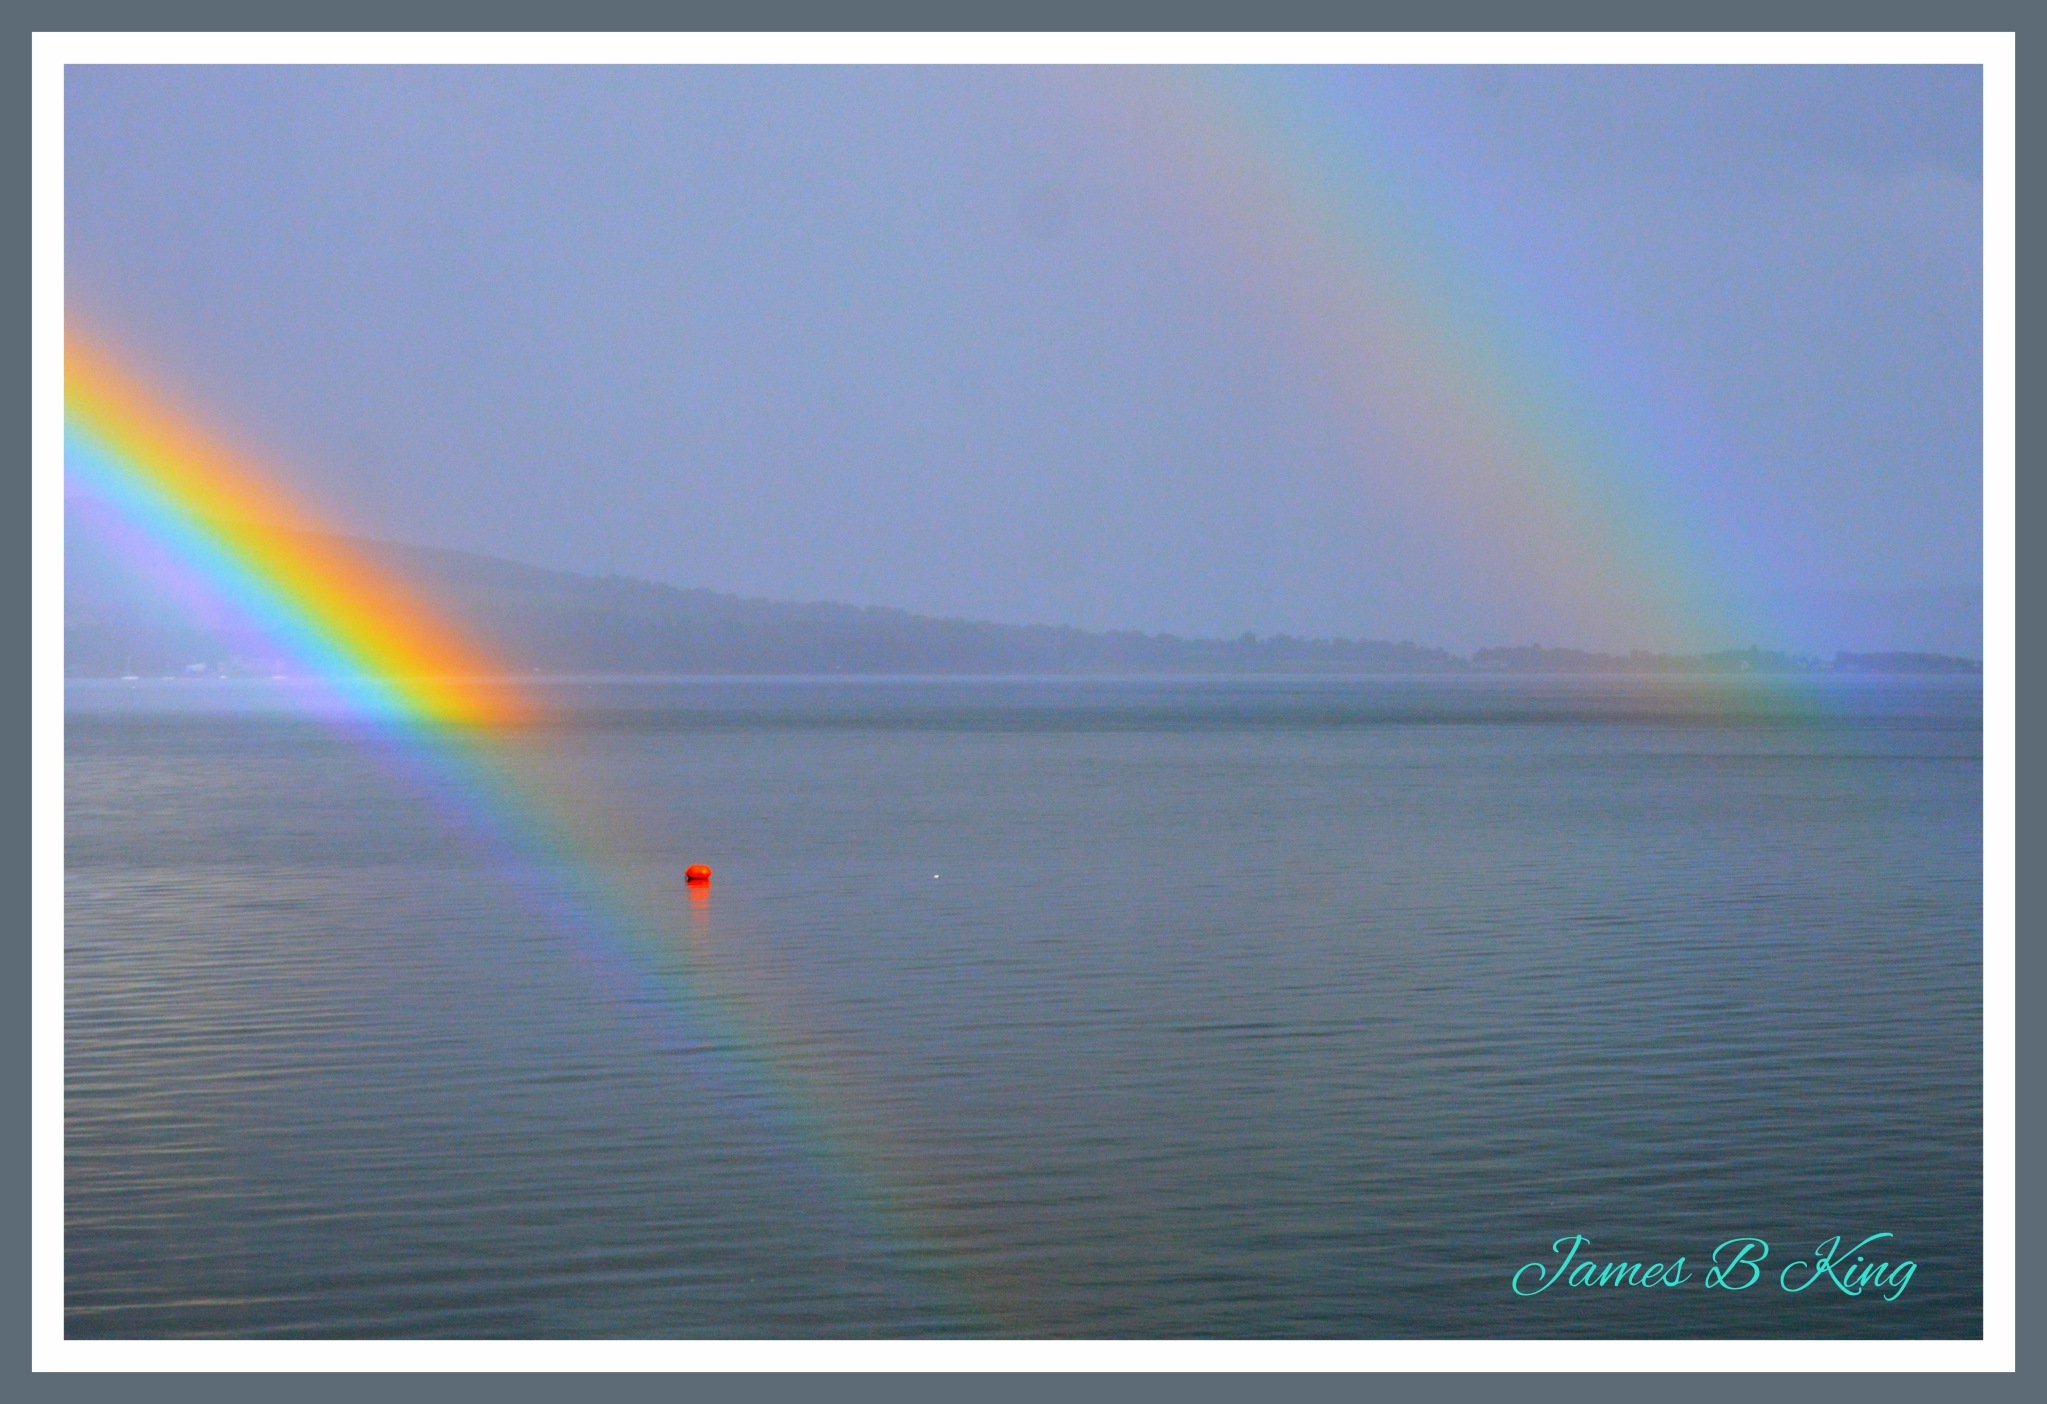 Delightful Double Rainbow by James Bullis-King